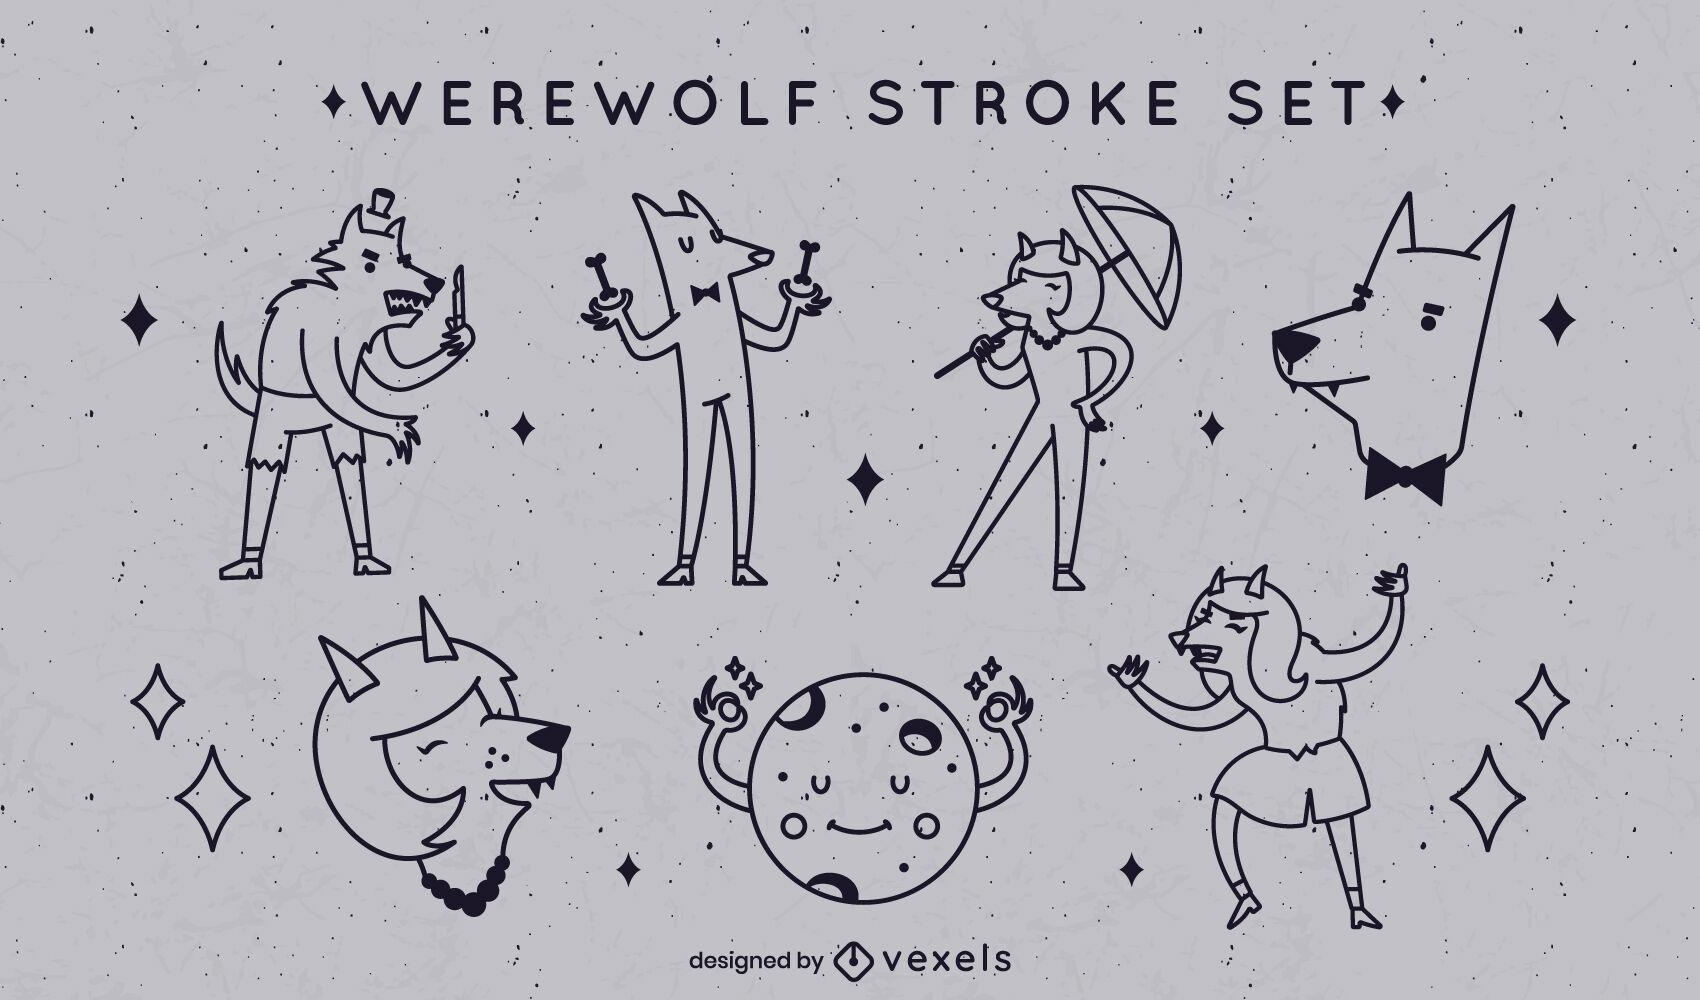 Werewolf halloween cartoon stroke set